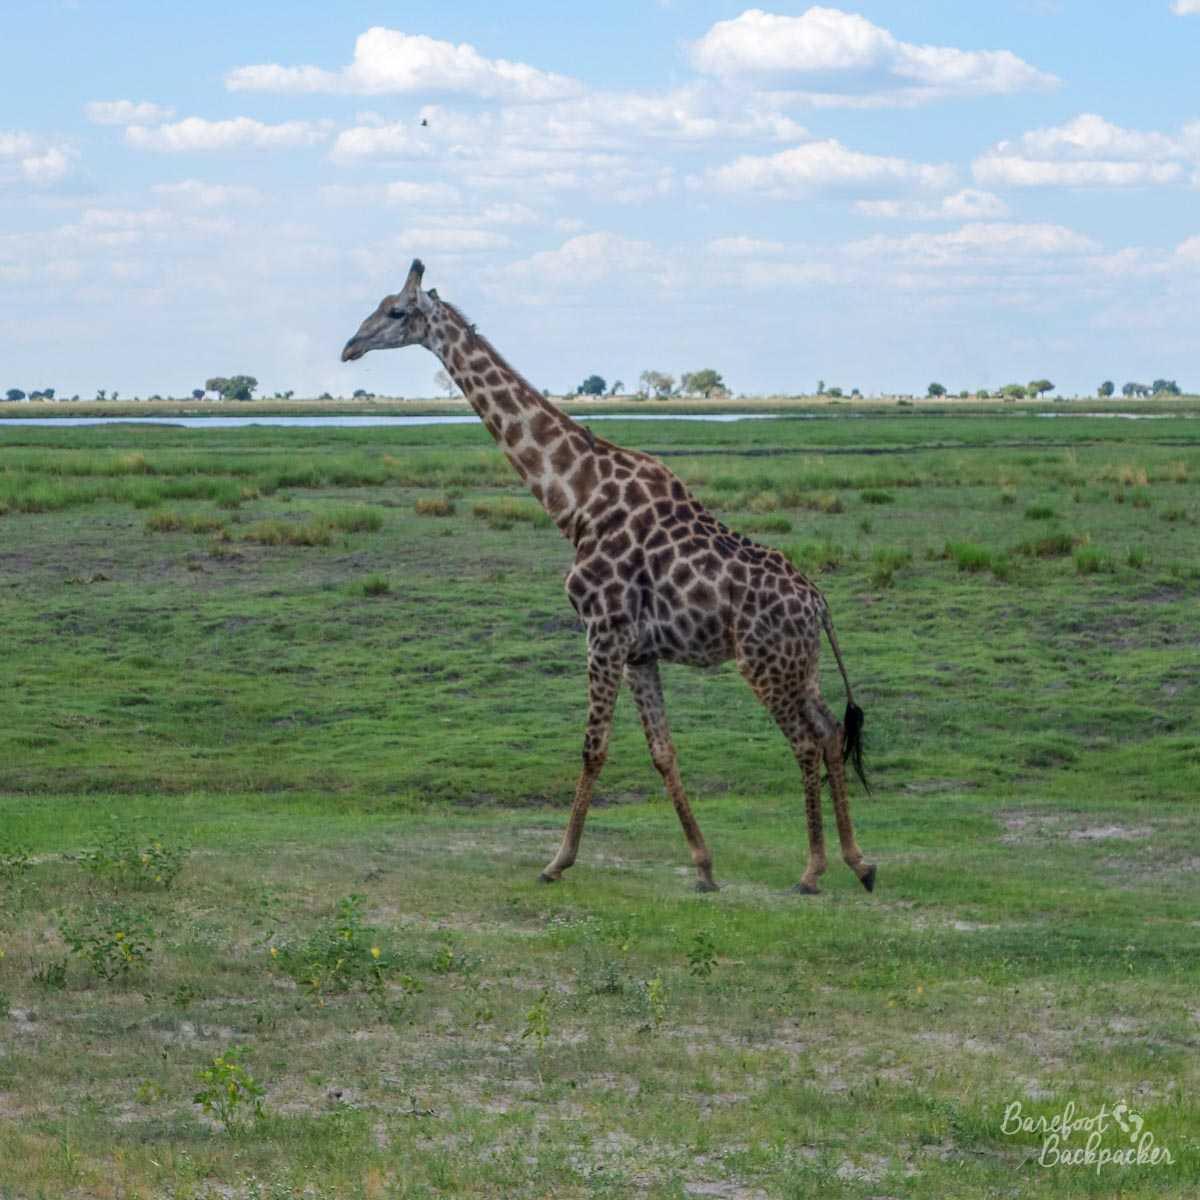 A giraffe, standing on the flatter plains of Chobe National Park.